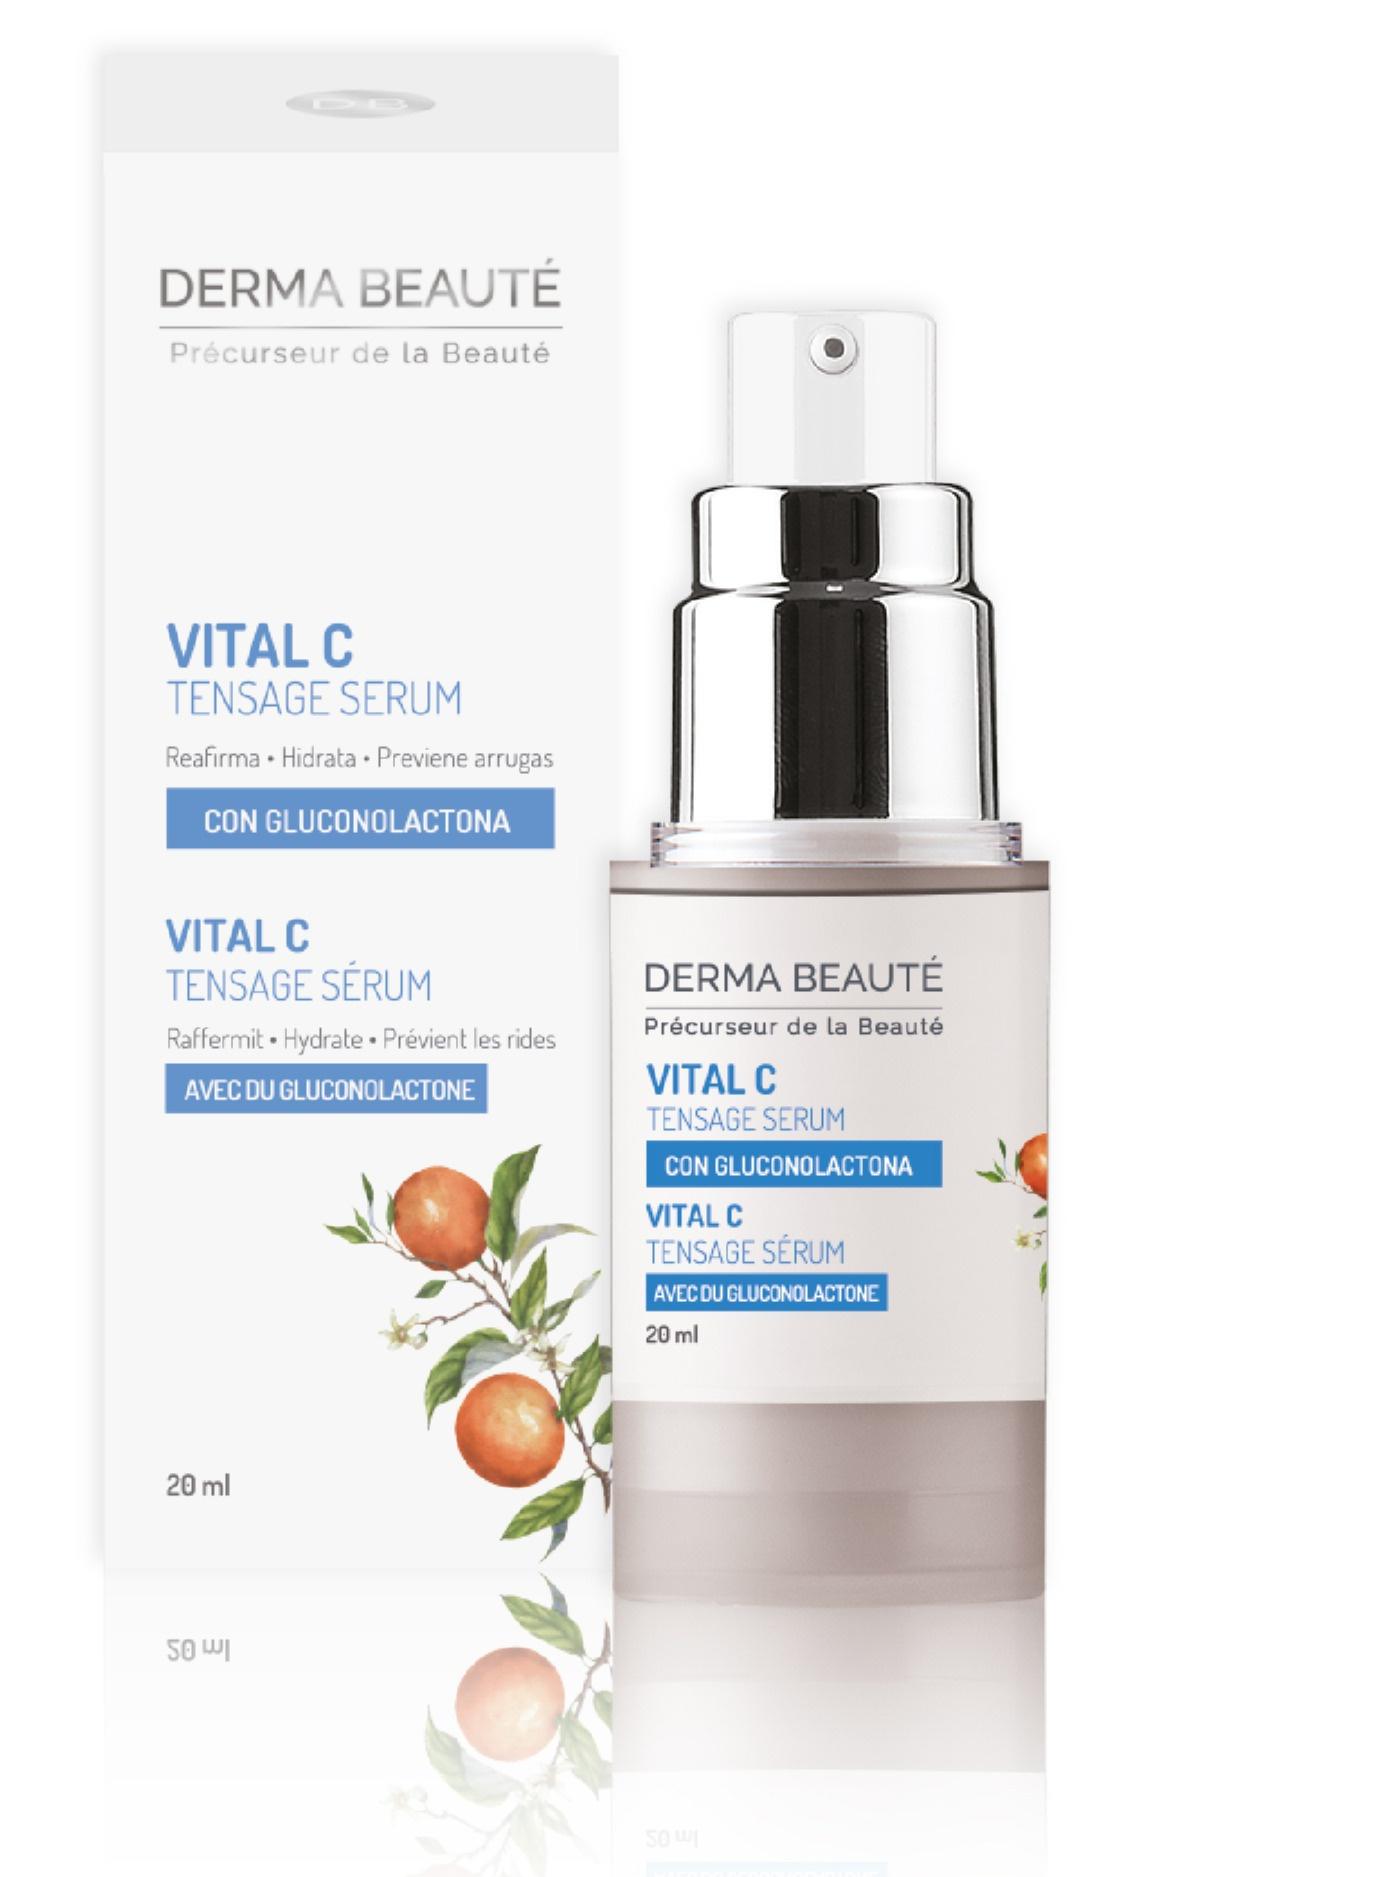 Derma Beauté Vital C Tensage Serum